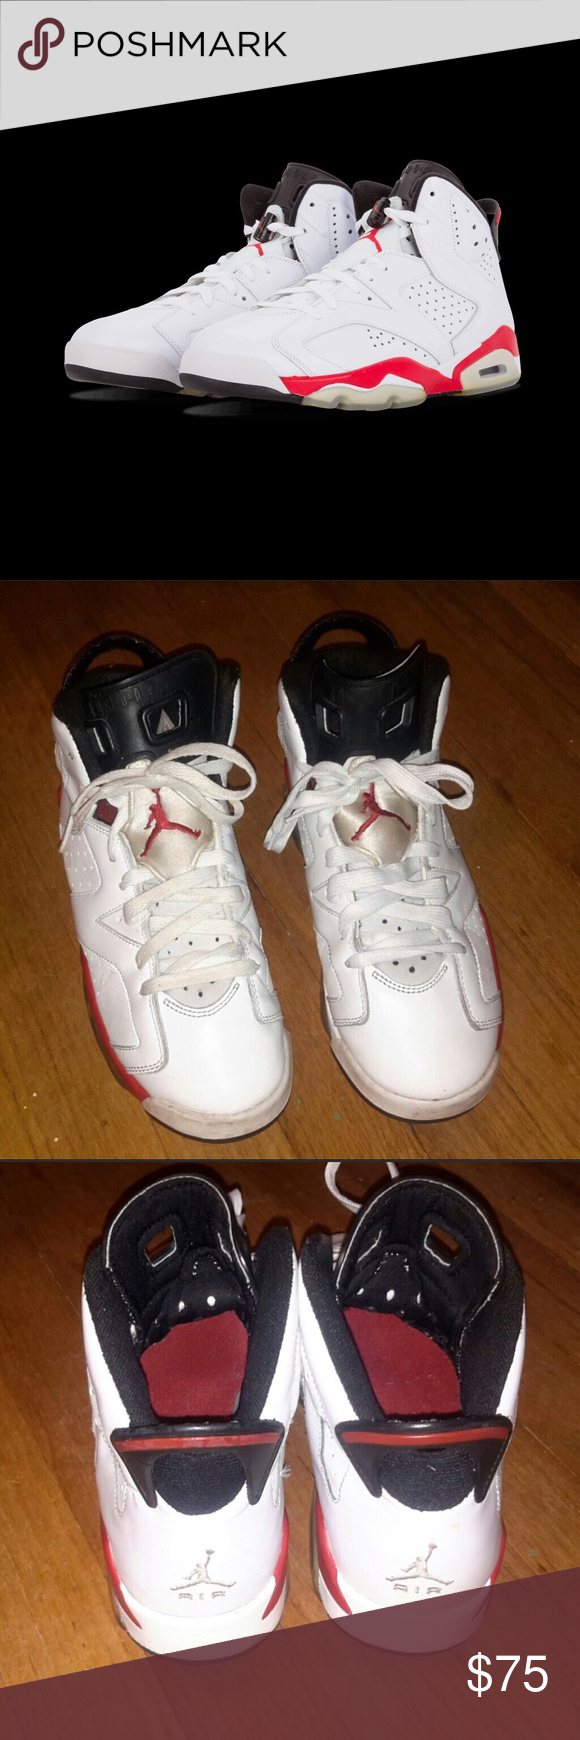 "bc56b4c4822fa3 Air Jordan 6 Retro ""Bulls"" White Varsity Red Black Classic pair of ..."